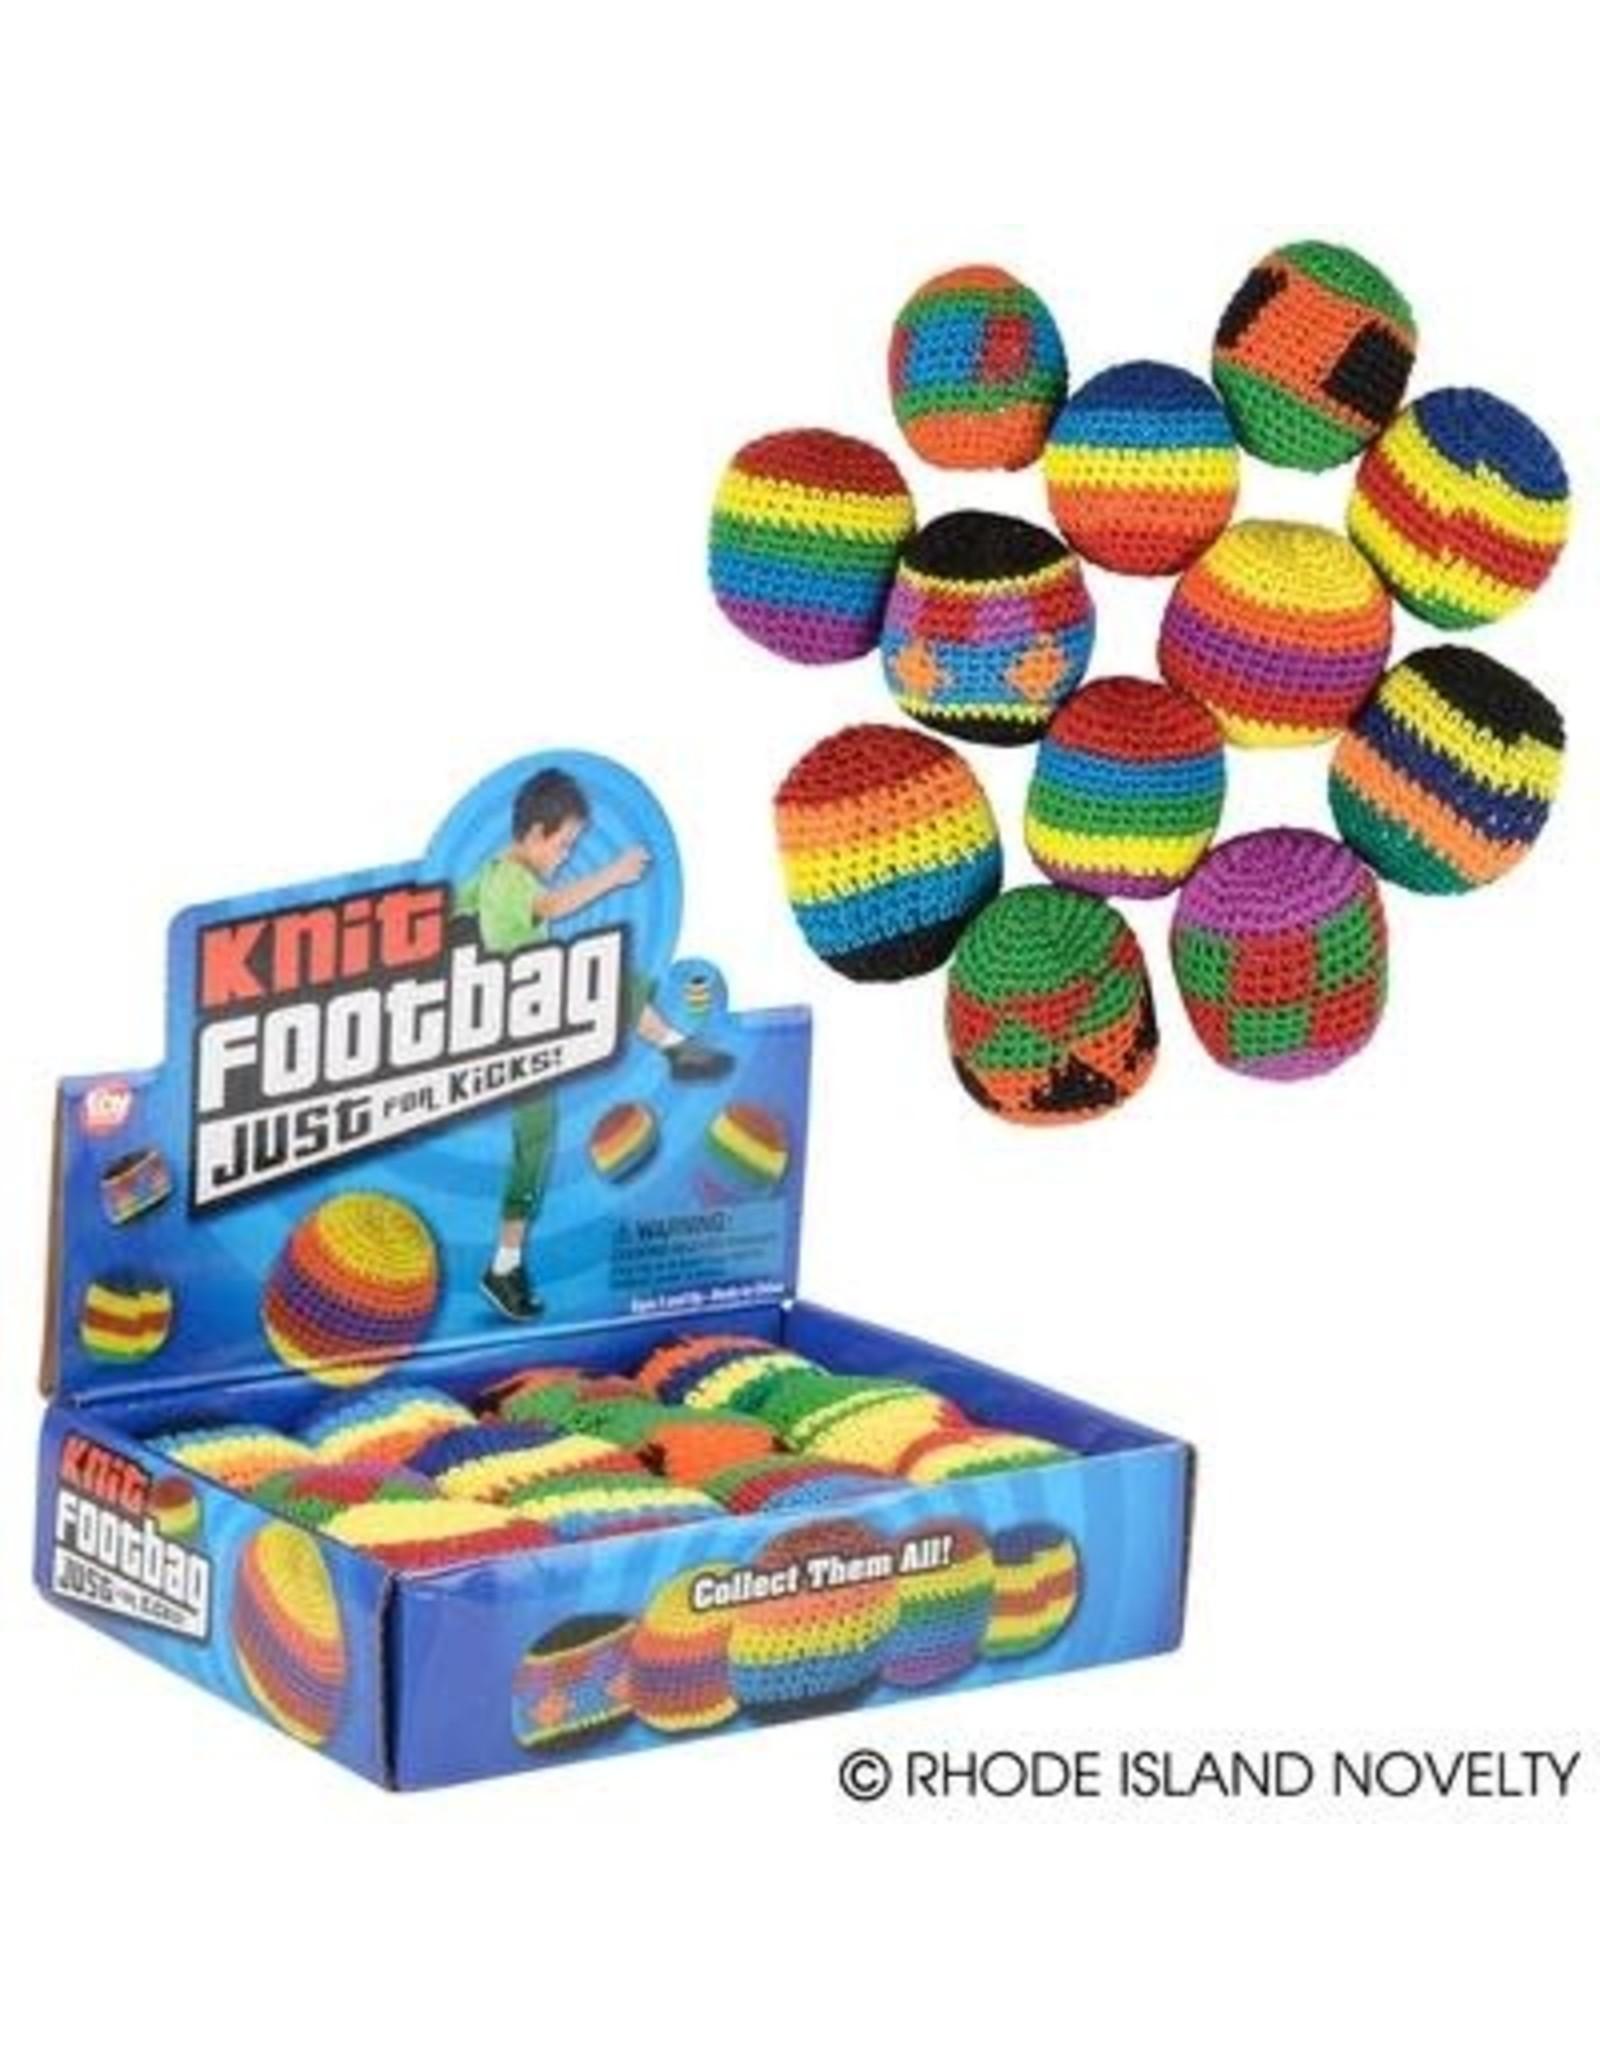 "RHODE ISLAND NOVELTY 2"" Knit Footbag - 1ct."